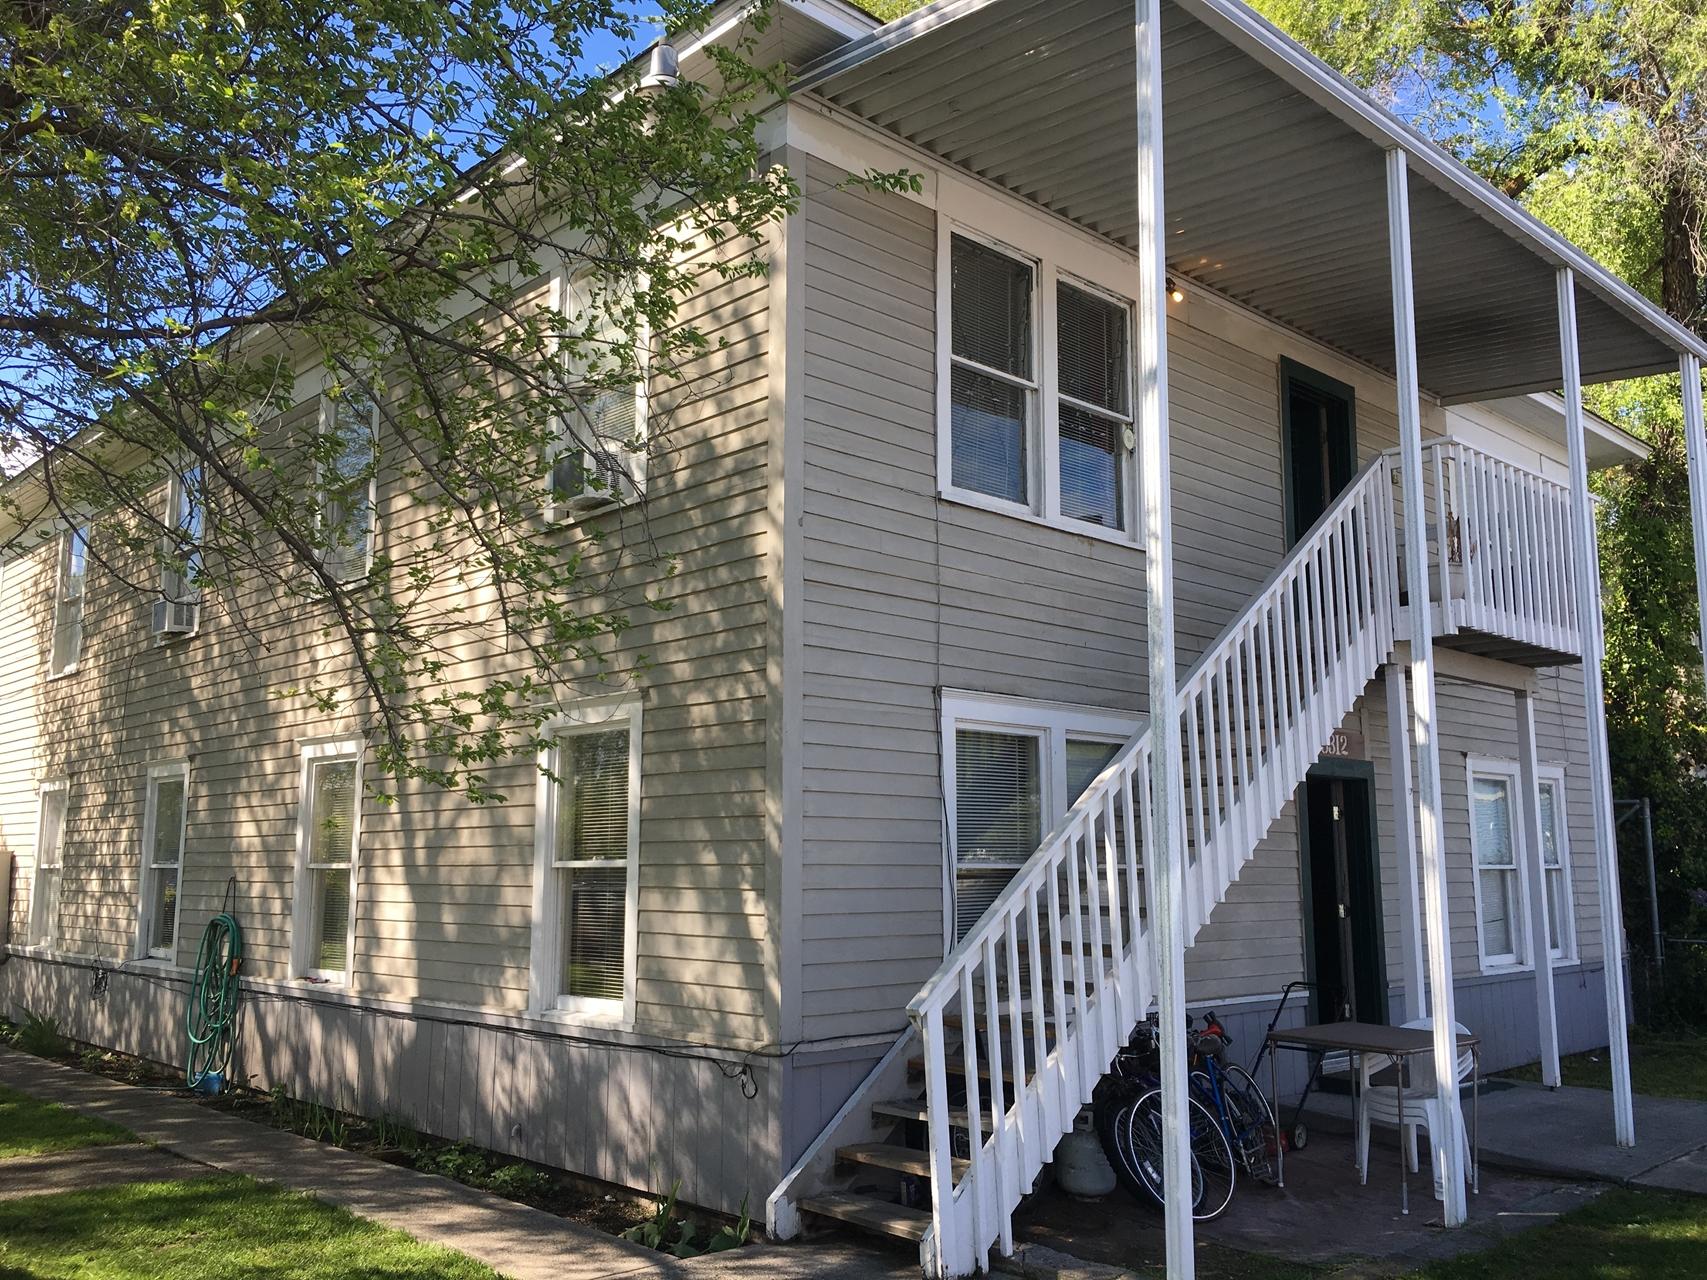 8 Unit Apartment in East Spokane  Sale: $265,000